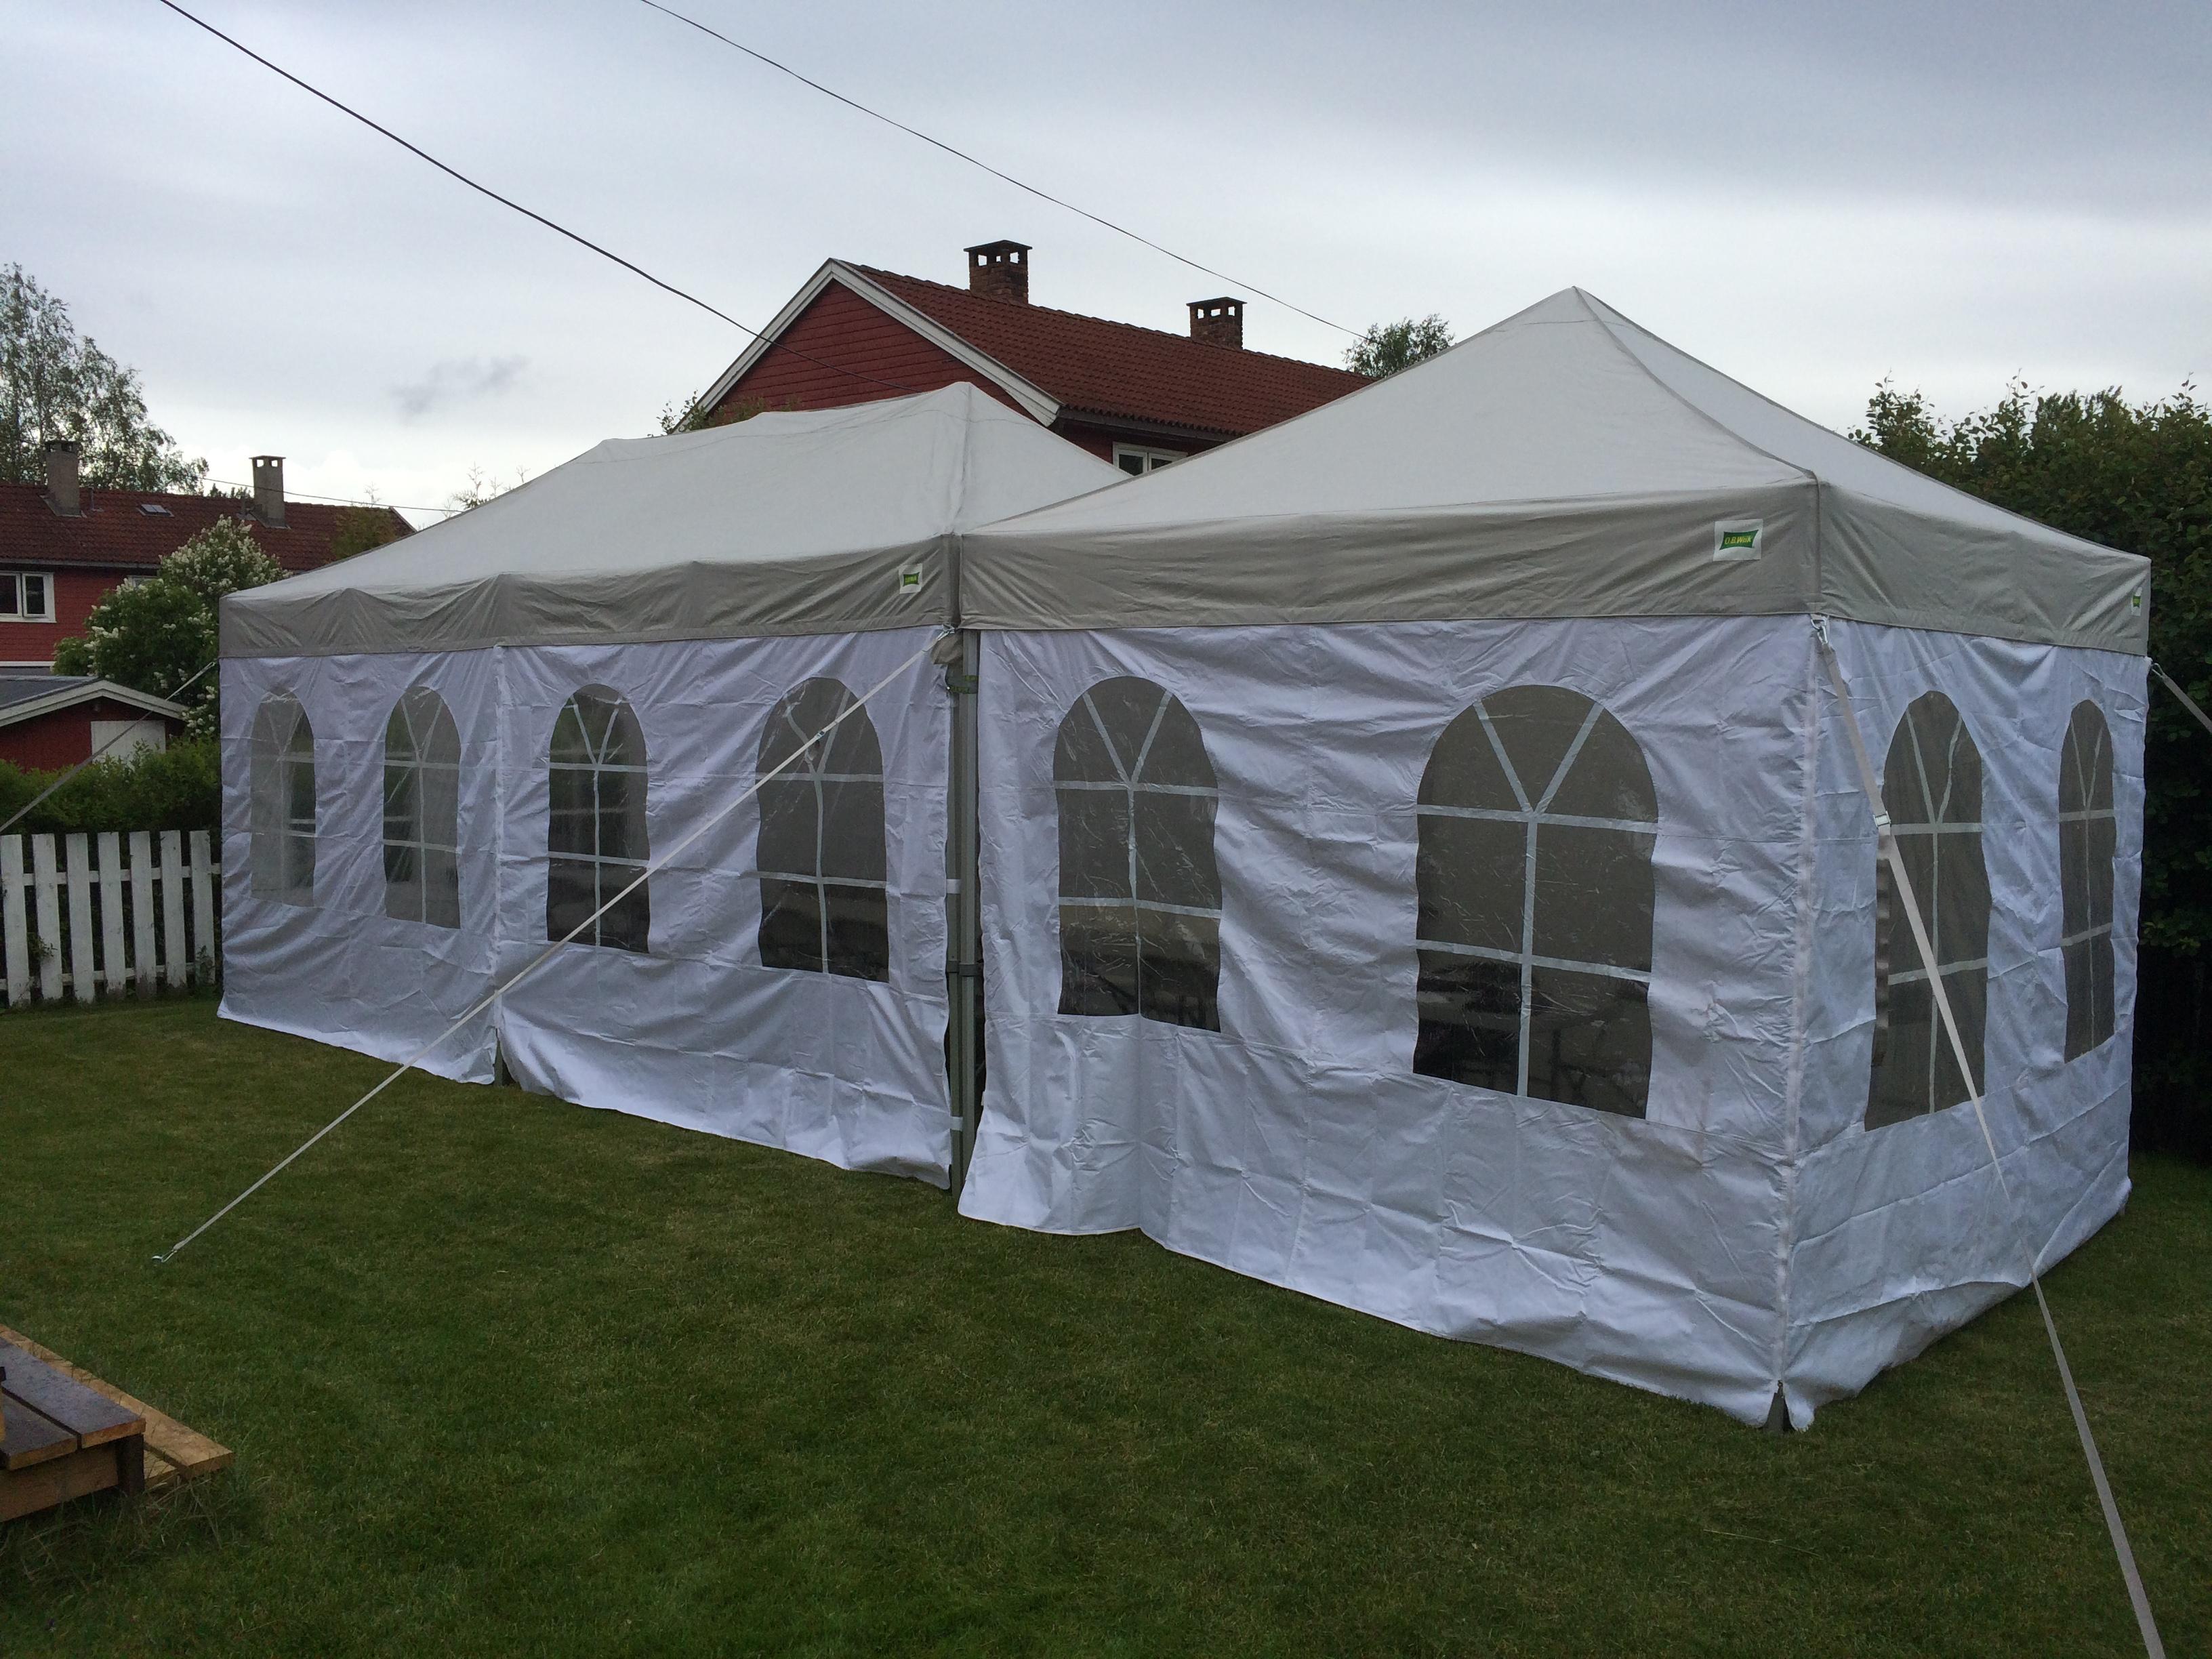 24 26 personer – 3×9 meter telt – telt1.no